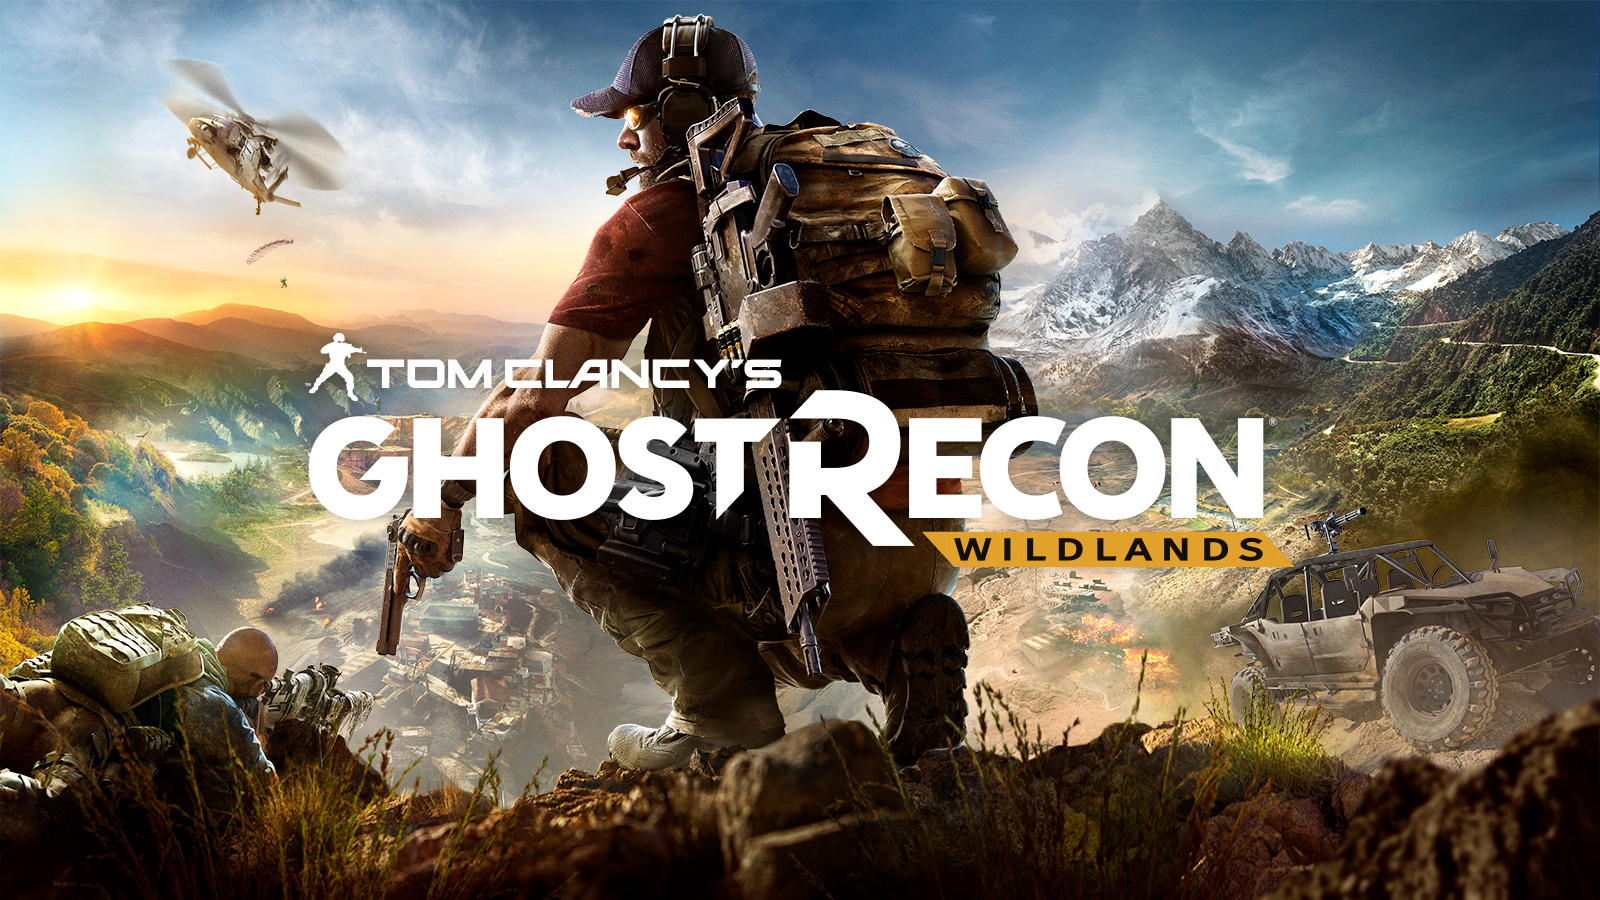 Tom Clancys Ghost Recon Wildlands 2017 Hd Games 4k: Tom Clancy's Ghost Recon: Wildlands Review (Ubisoft